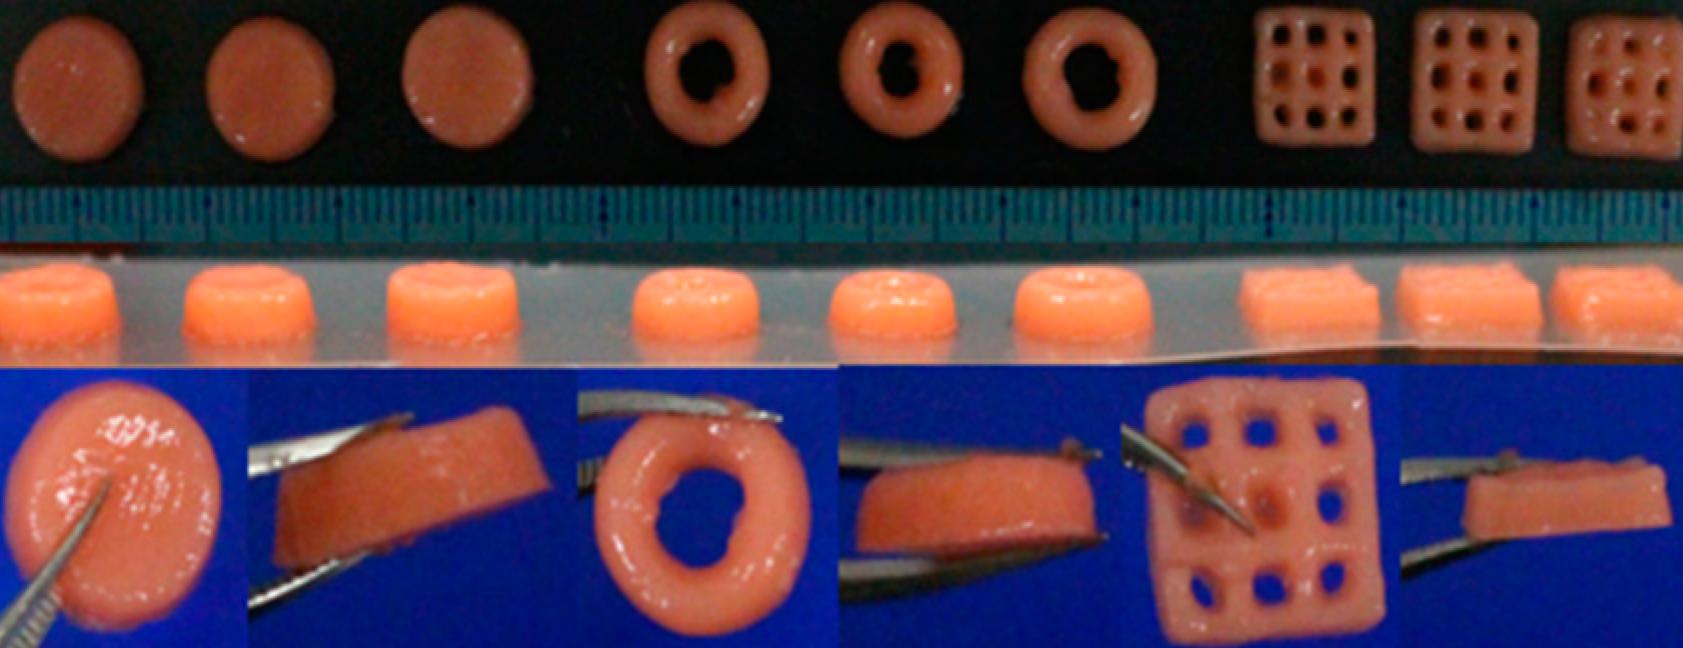 Nagoya researchers 3D bioprint fish gelatin-based anticancer patches 1